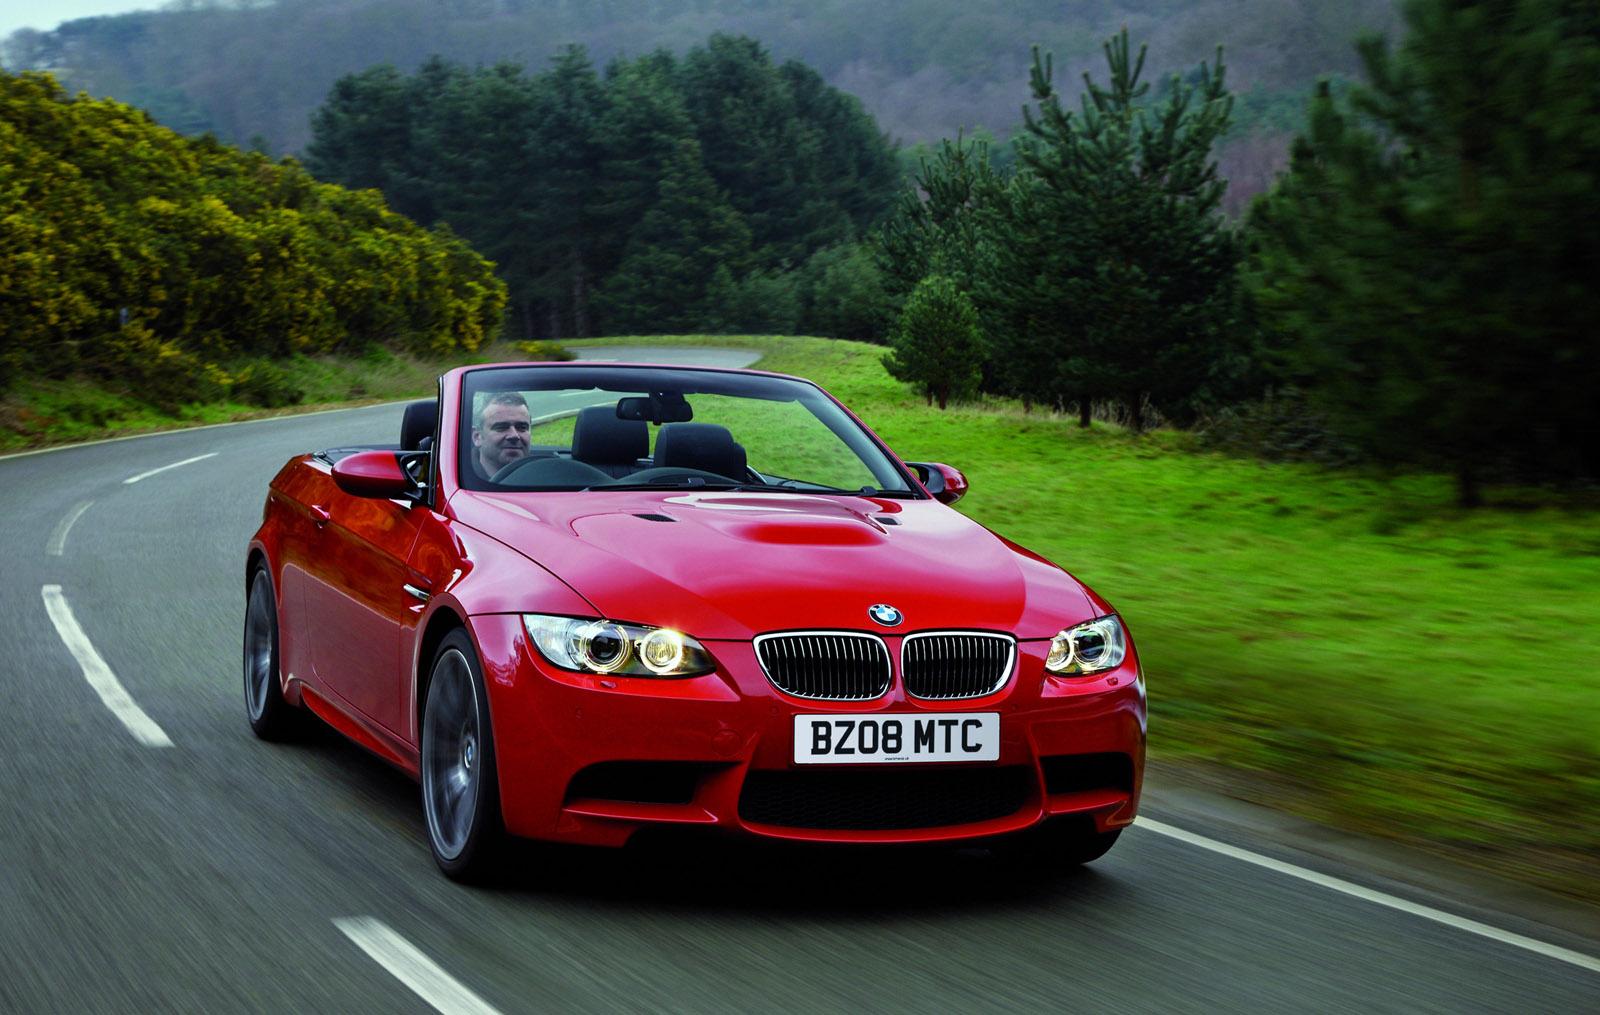 2008 BMW M Zero Concept - Car Pictures